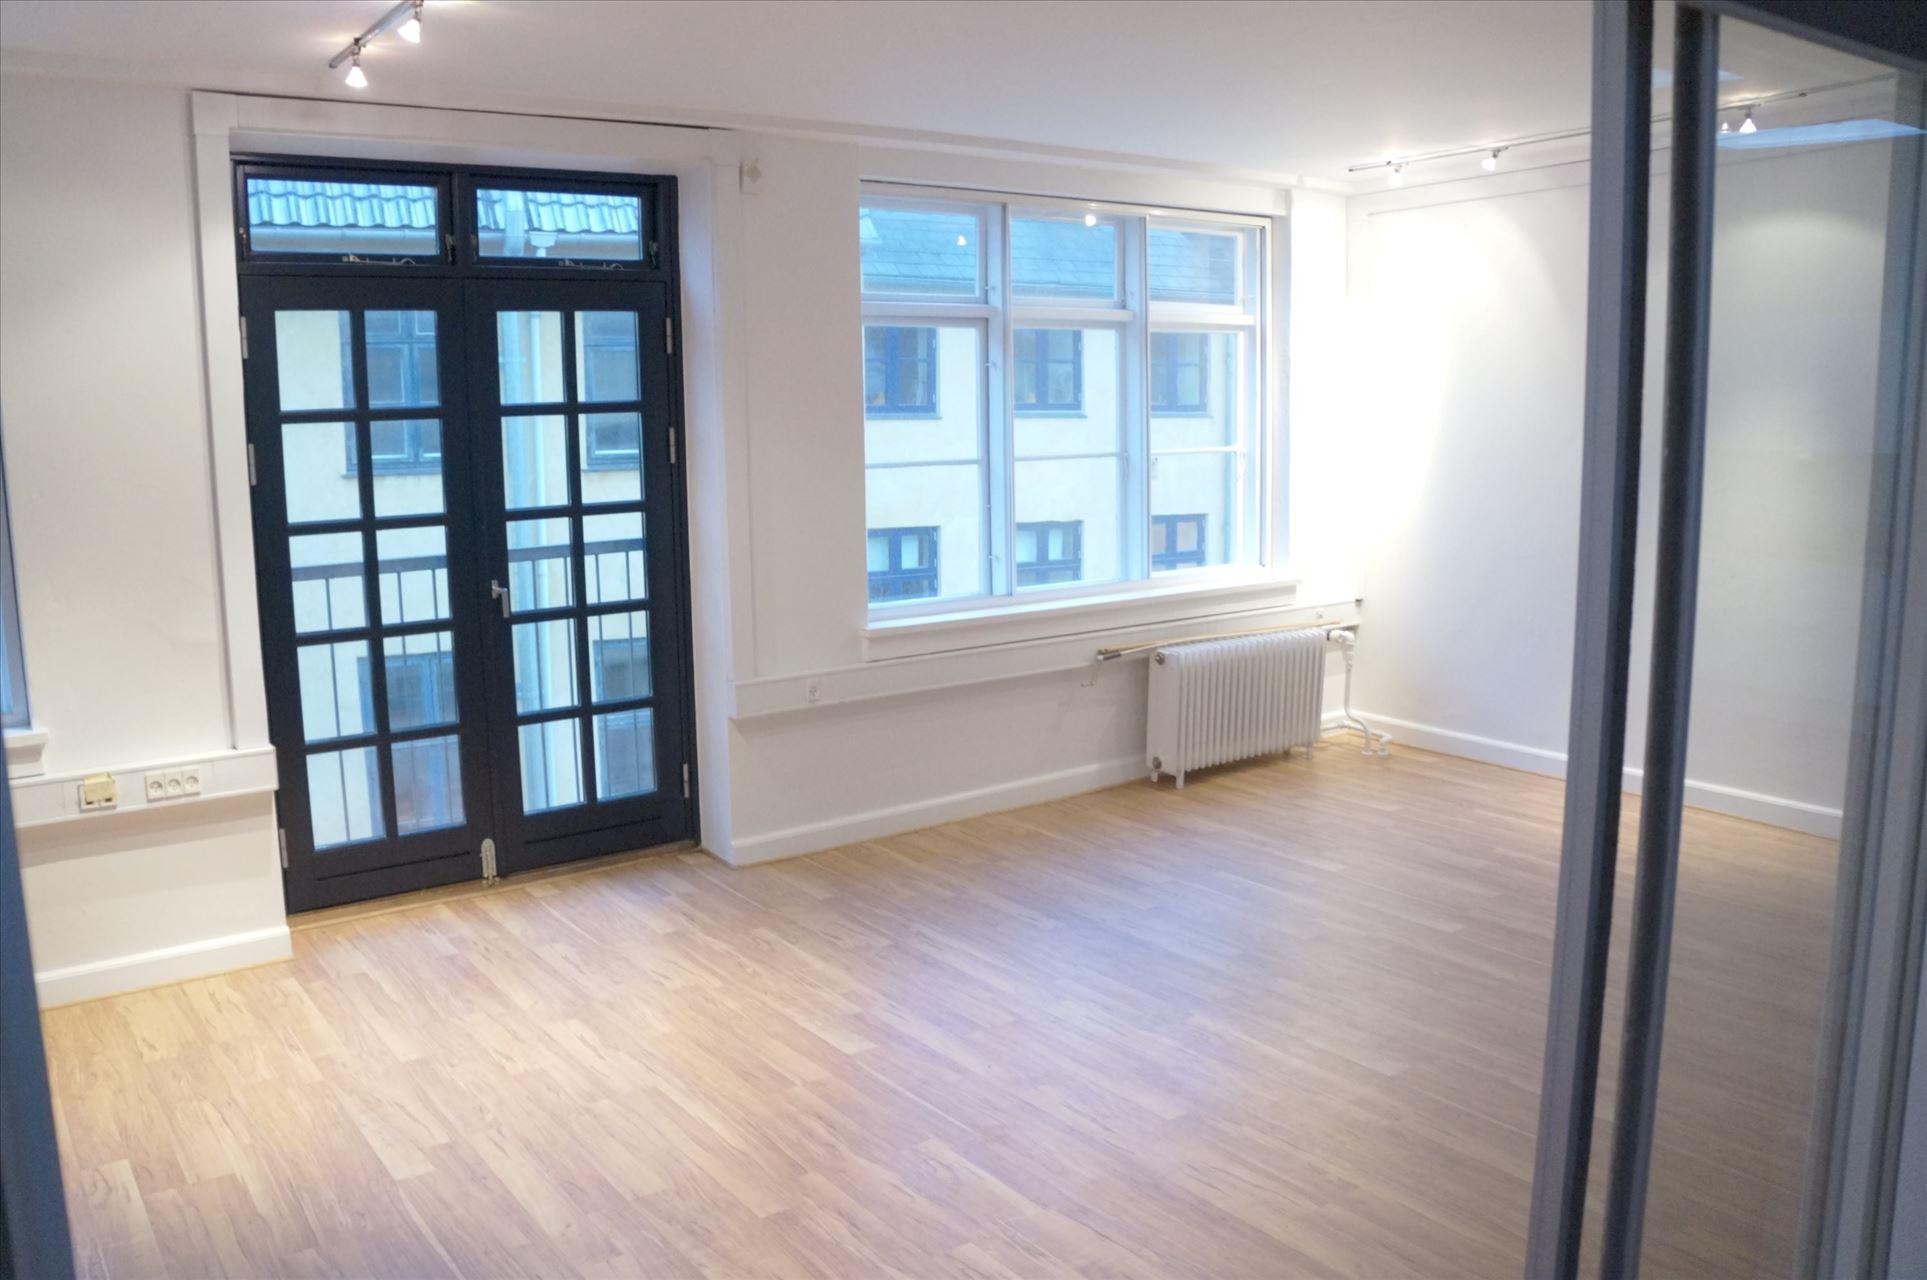 125 m² kontor